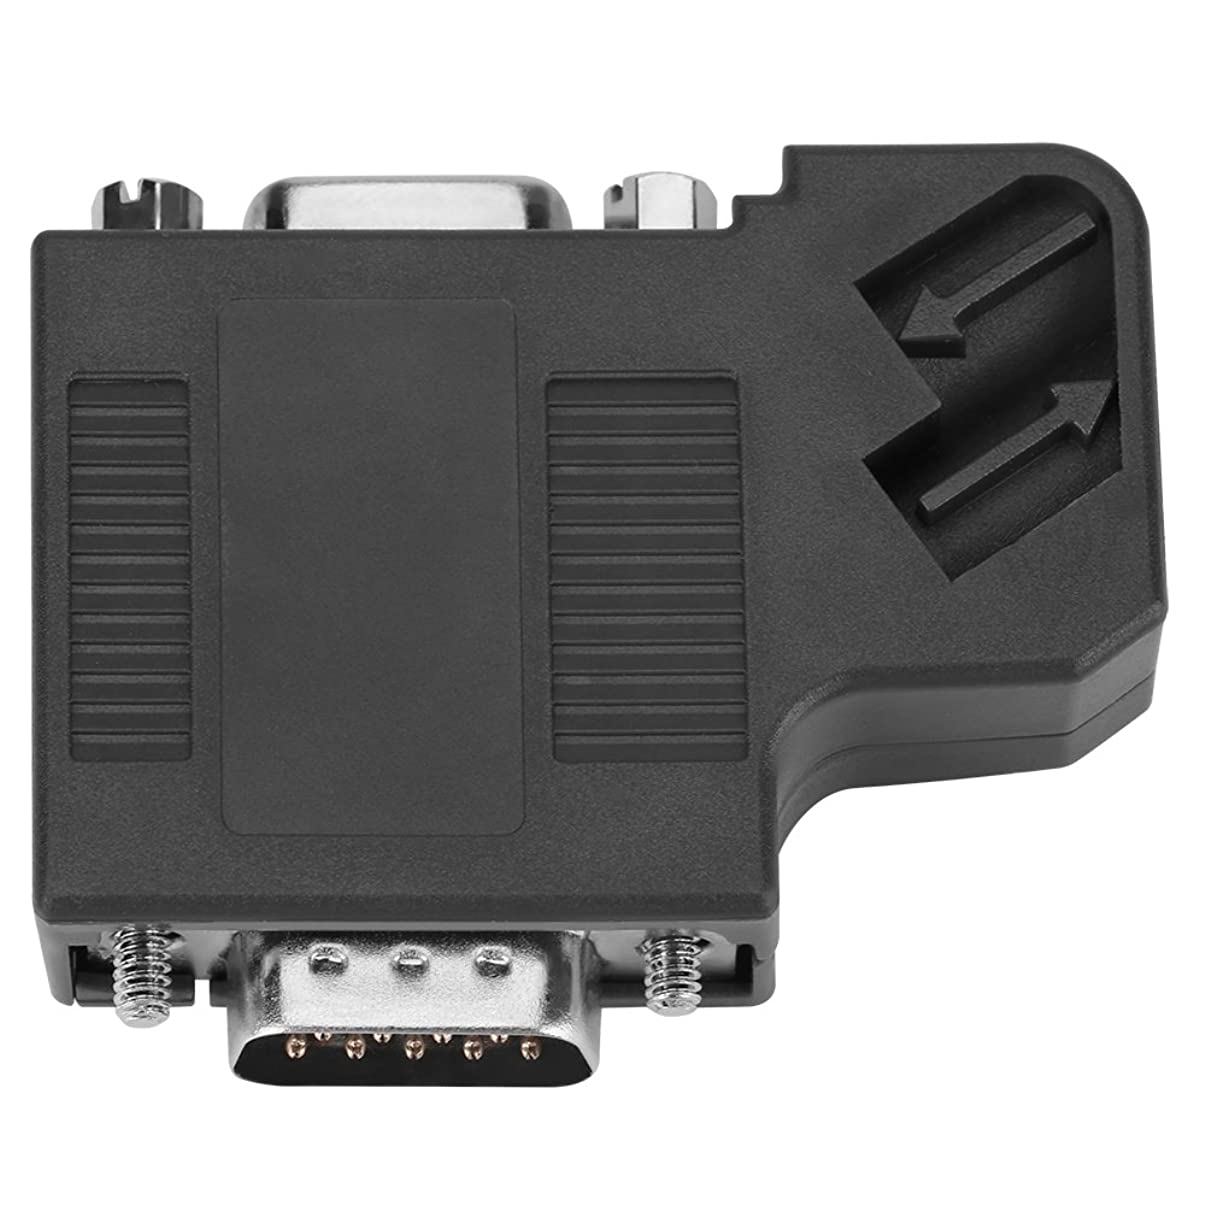 Akozon DP Data Connector, 1pcs 6ES7 972-0BB41-0XA0 DP Plug Profibus Bus Connector Adapter Electronic Data Systems